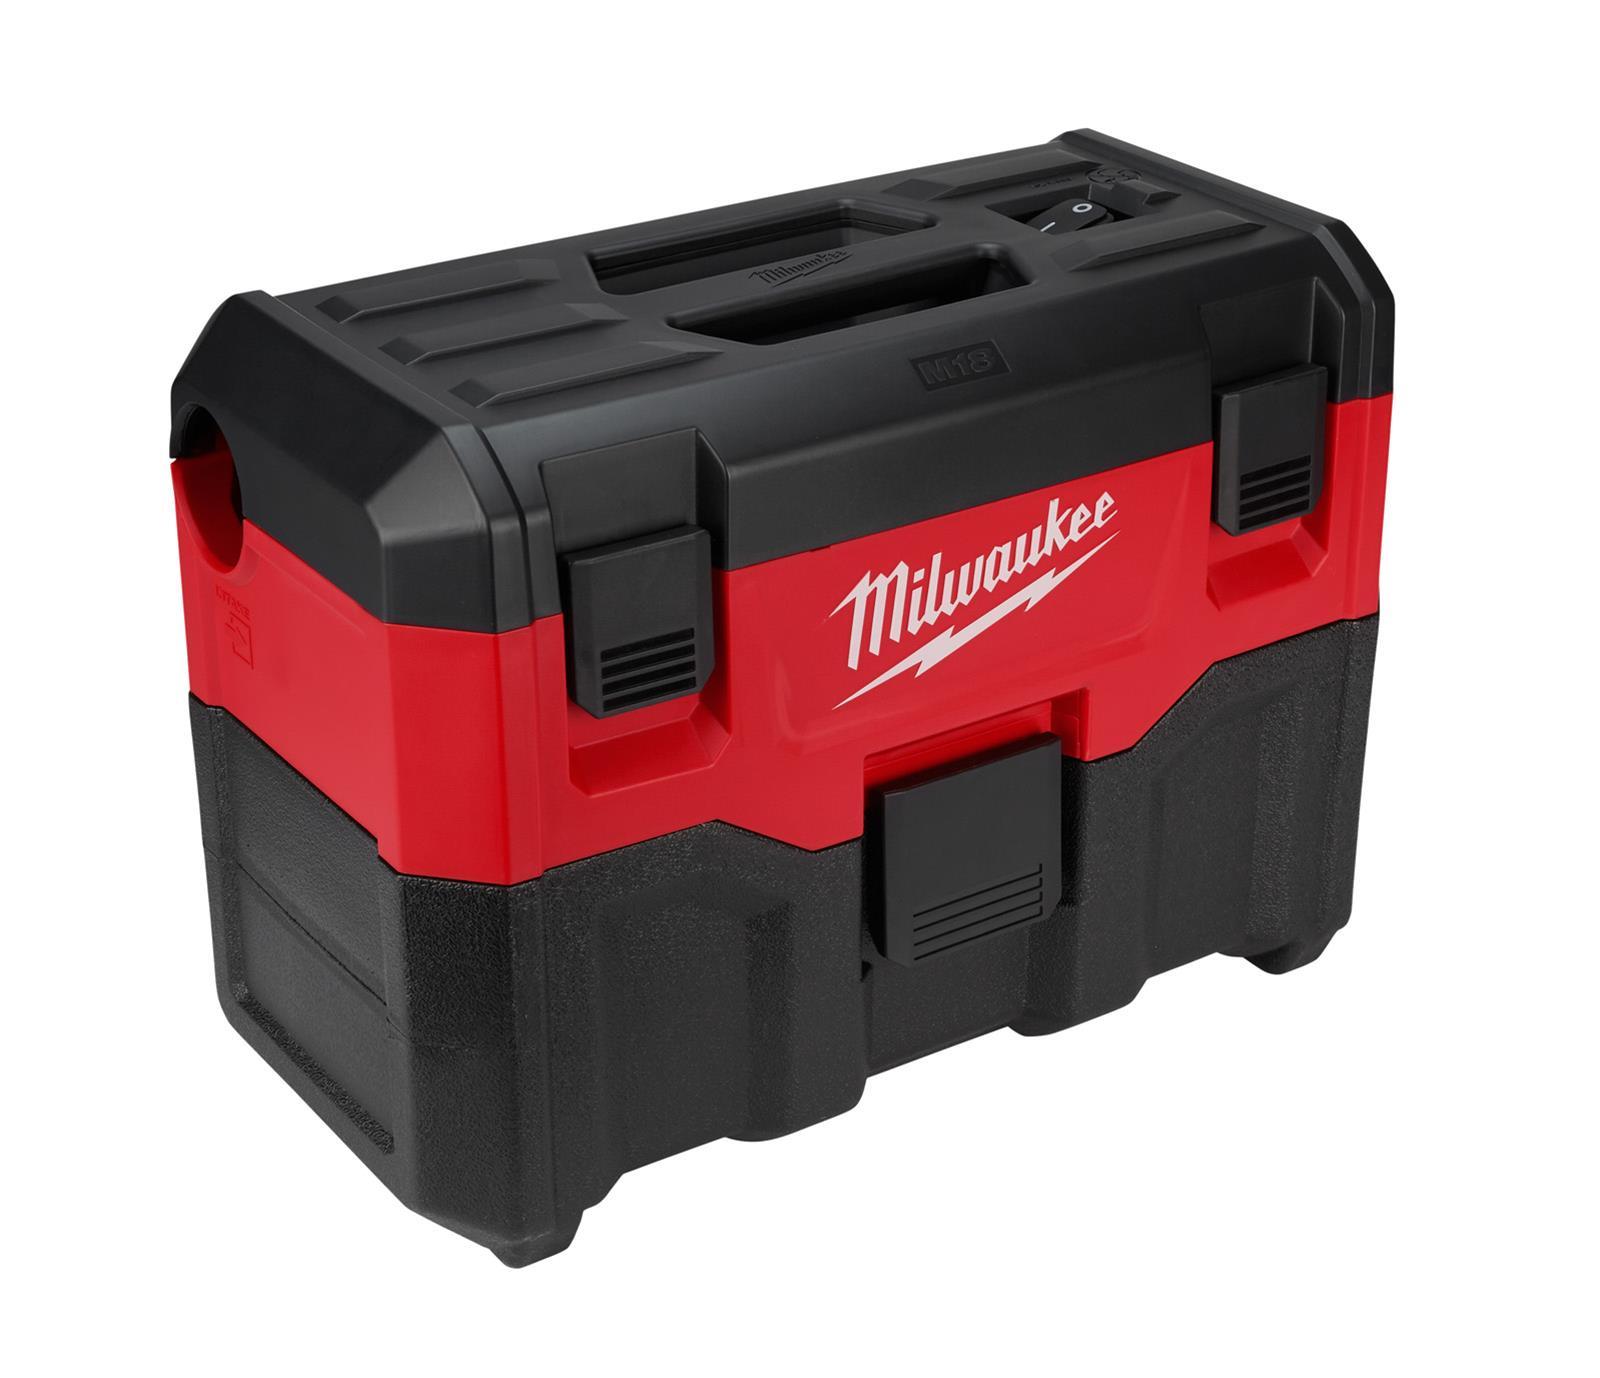 Milwaukee M18 Cordless 2-Gallon Wet/Dry Vacuum Cleaners